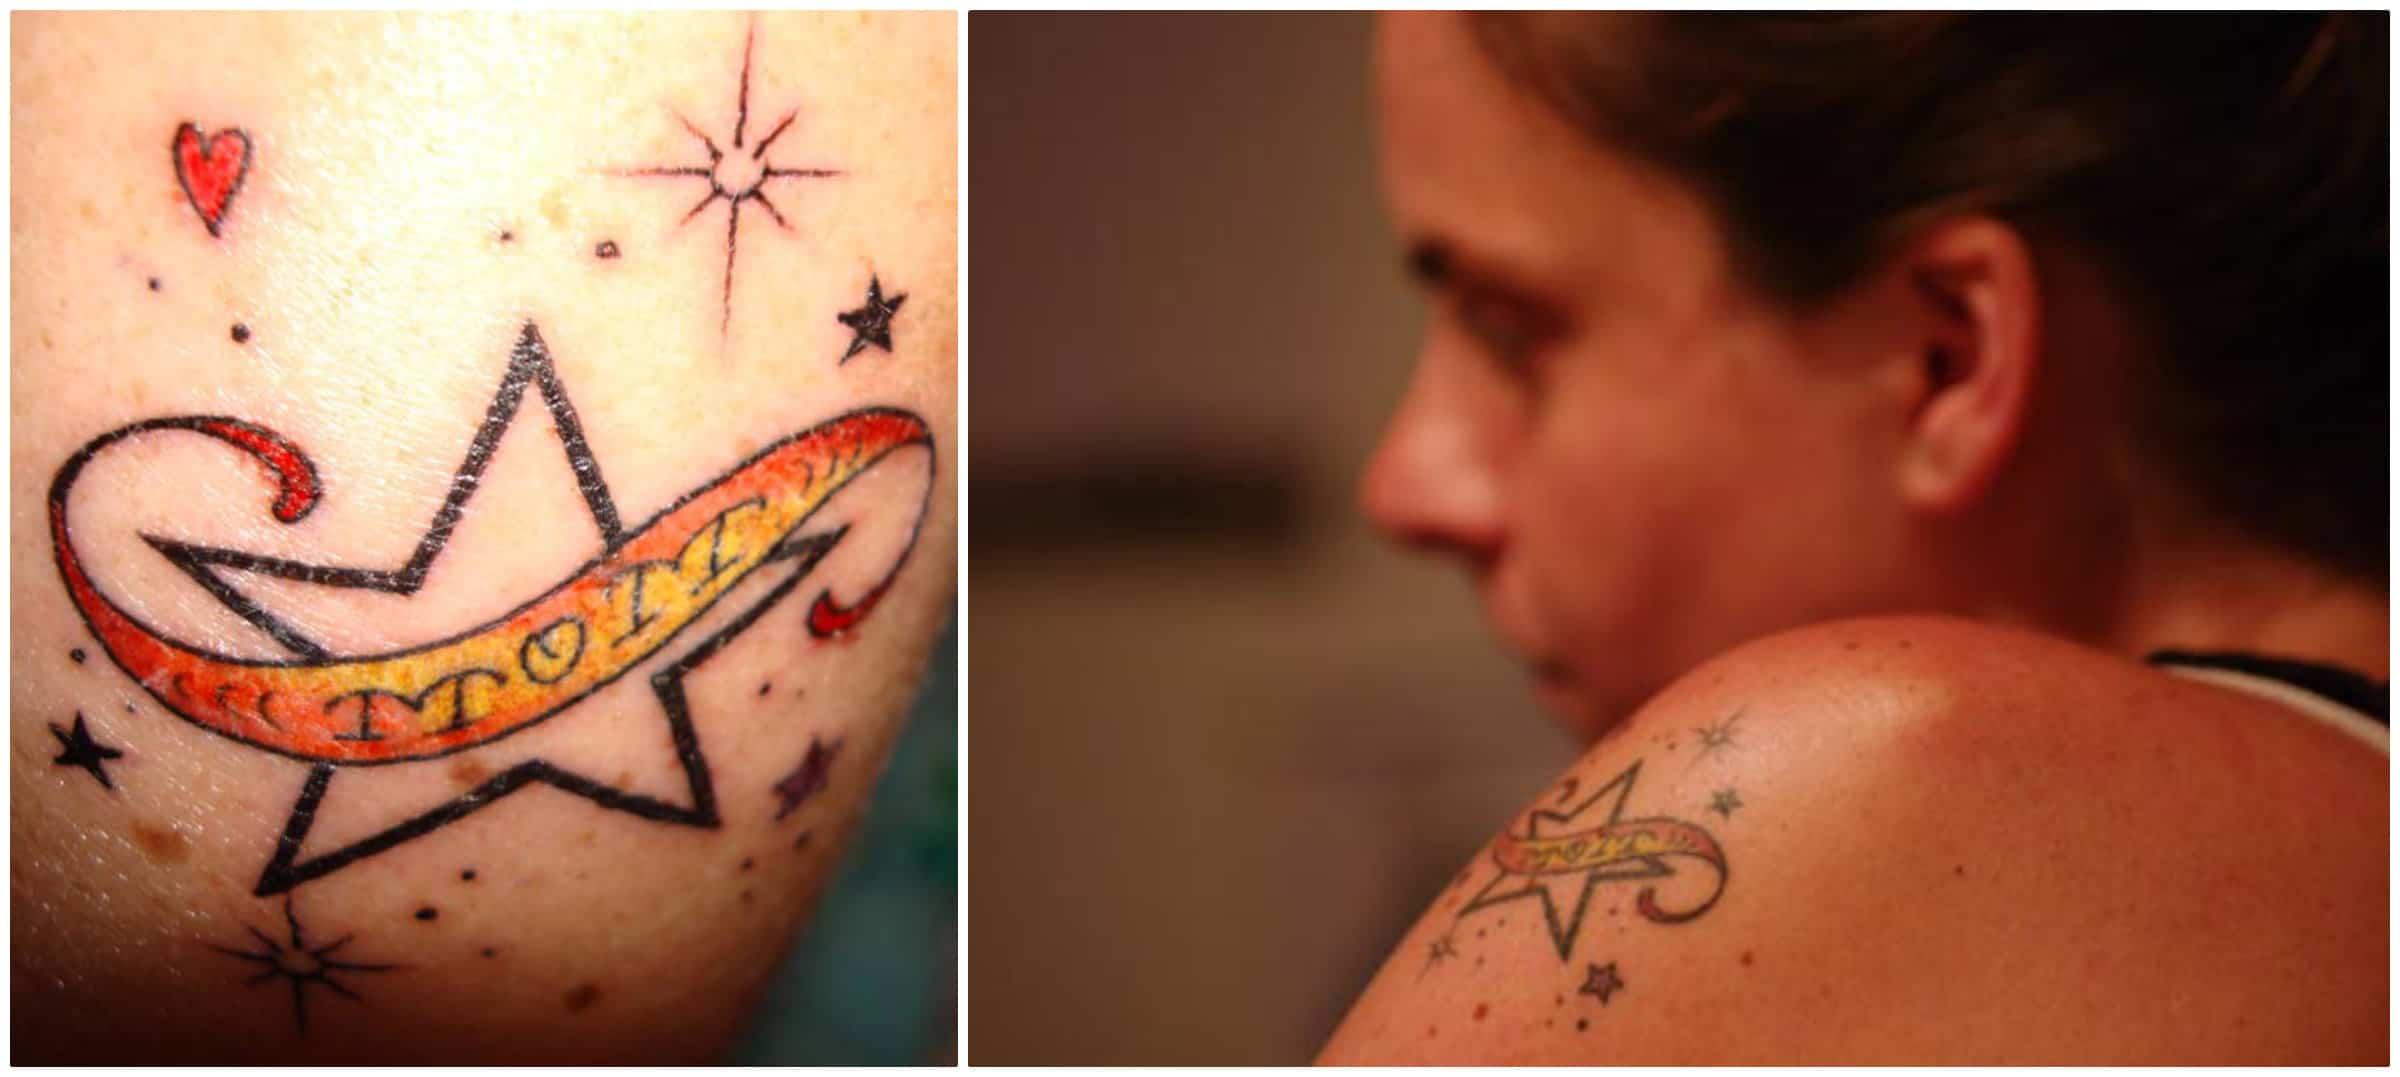 moeder dochter tattoo symbool